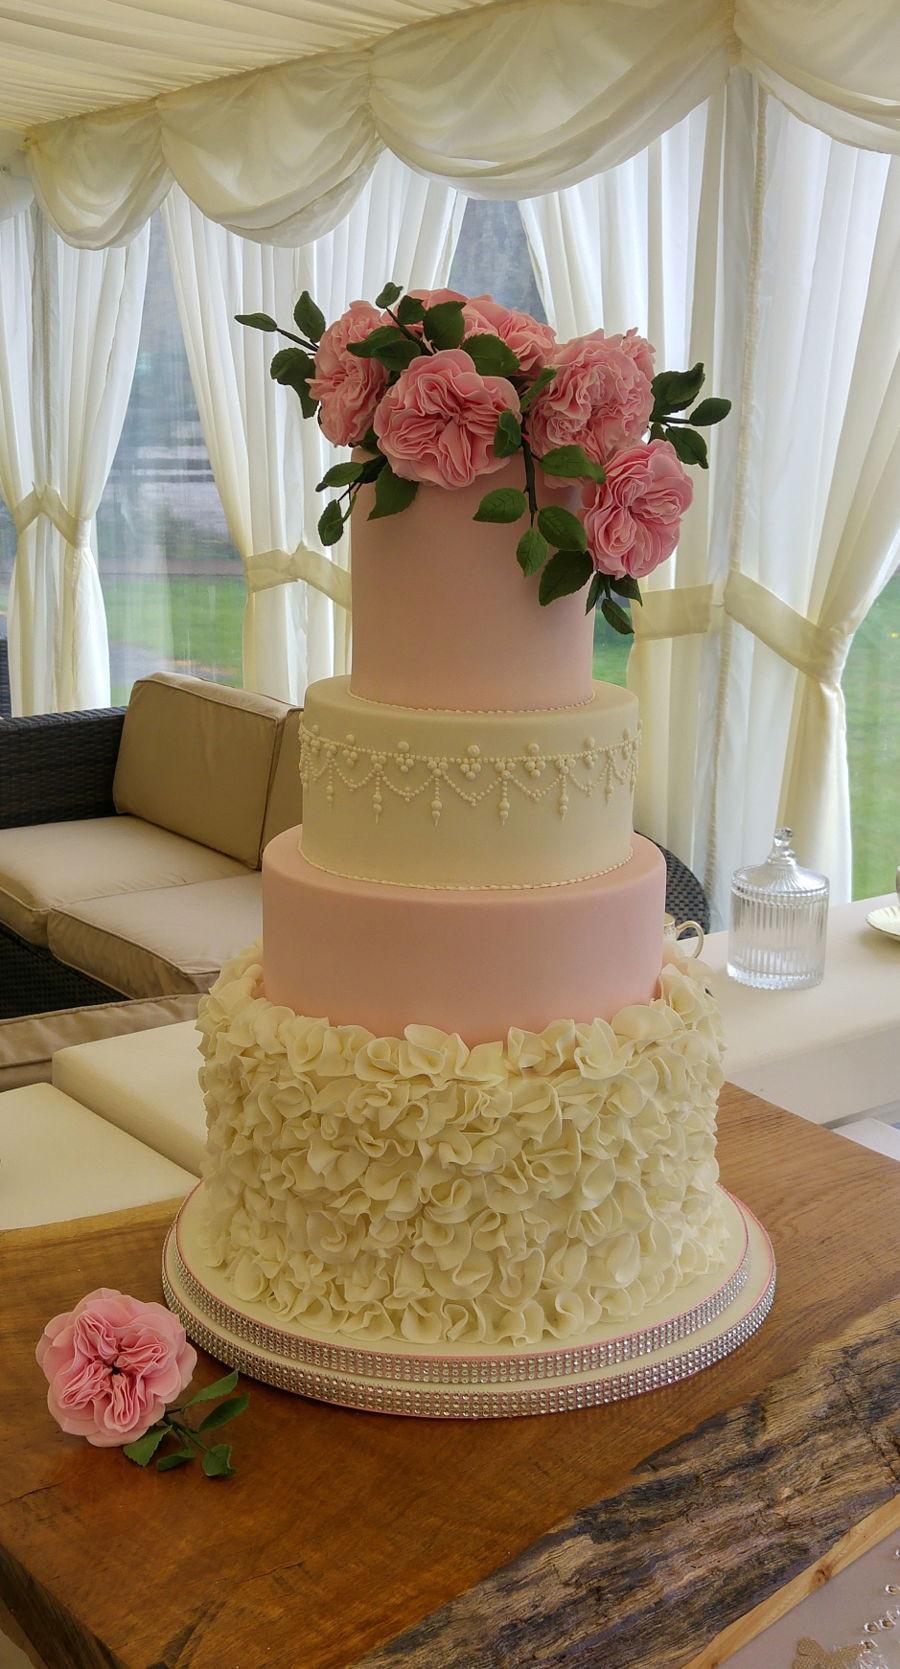 Wedding Cakes Austin  Ruffles And David Austin Roses Wedding Cake CakeCentral